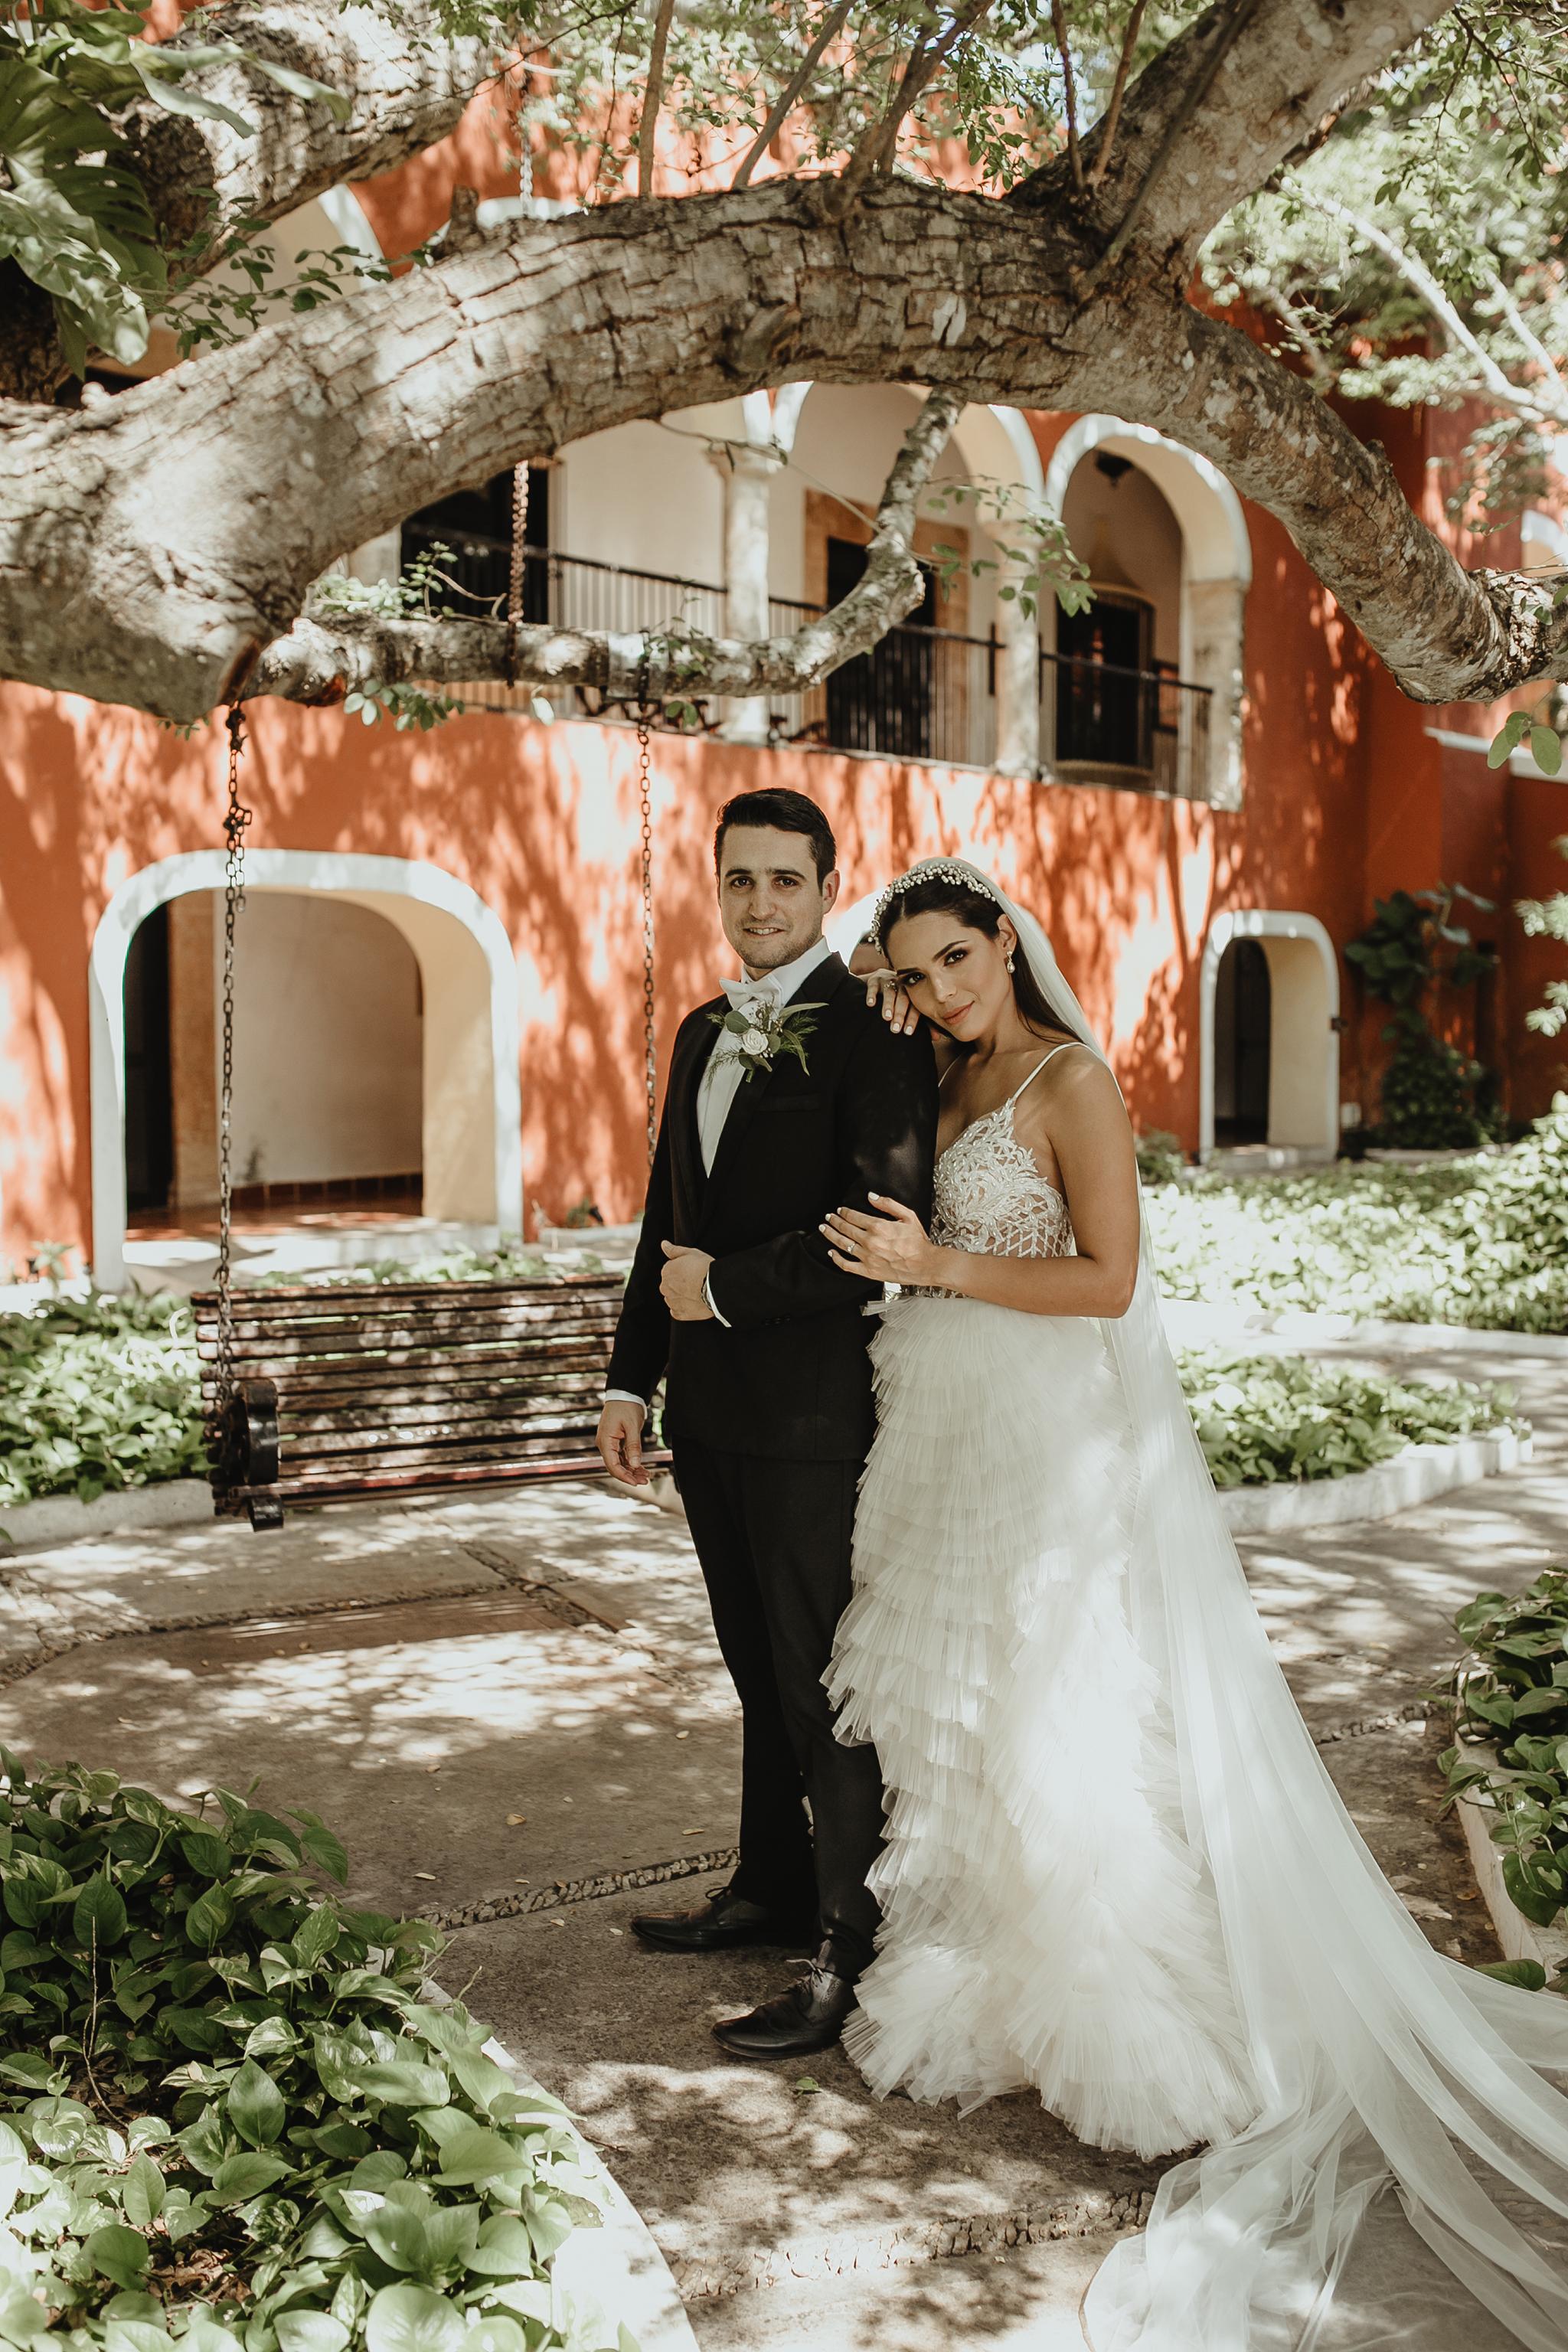 0353R&F__WeddingDestination_Weddingmerida_BodaMexico_FotografoDeBodas_FabrizioSimoneenFotografo.jpg